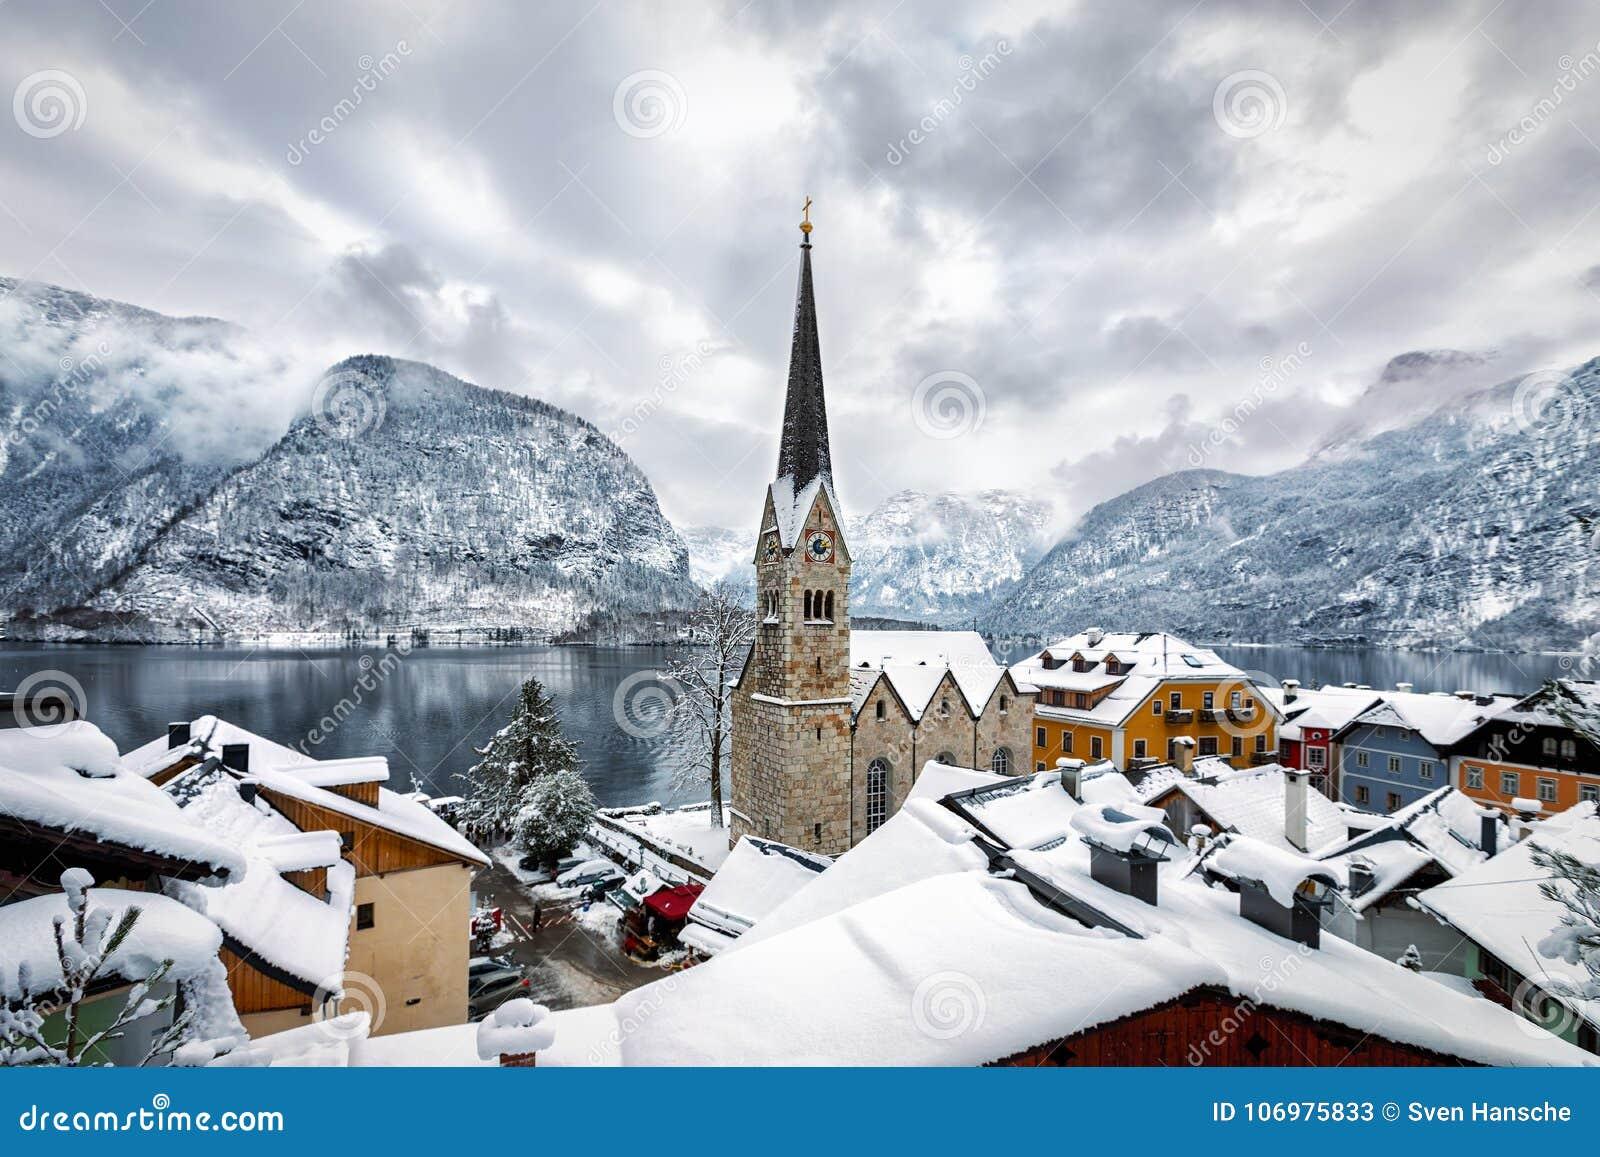 View over the village of Hallstatt in the Austrian Alps